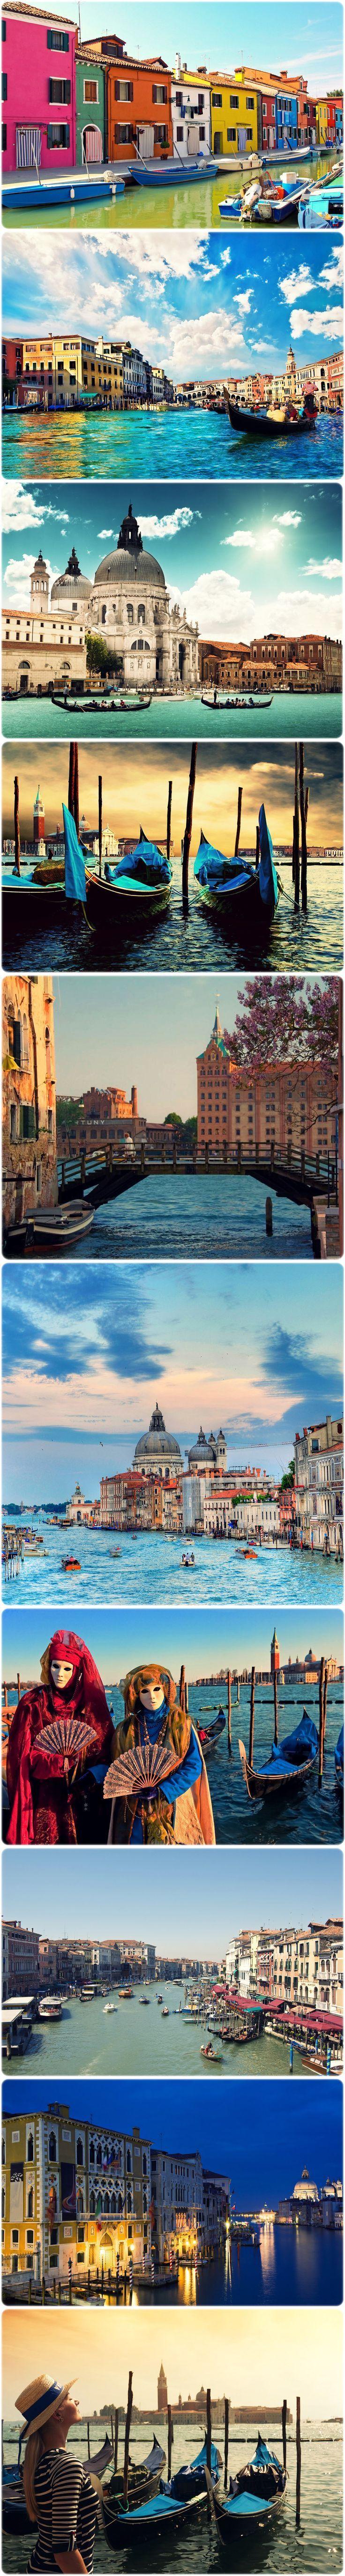 Venice, Italy #wimco #travel #villa